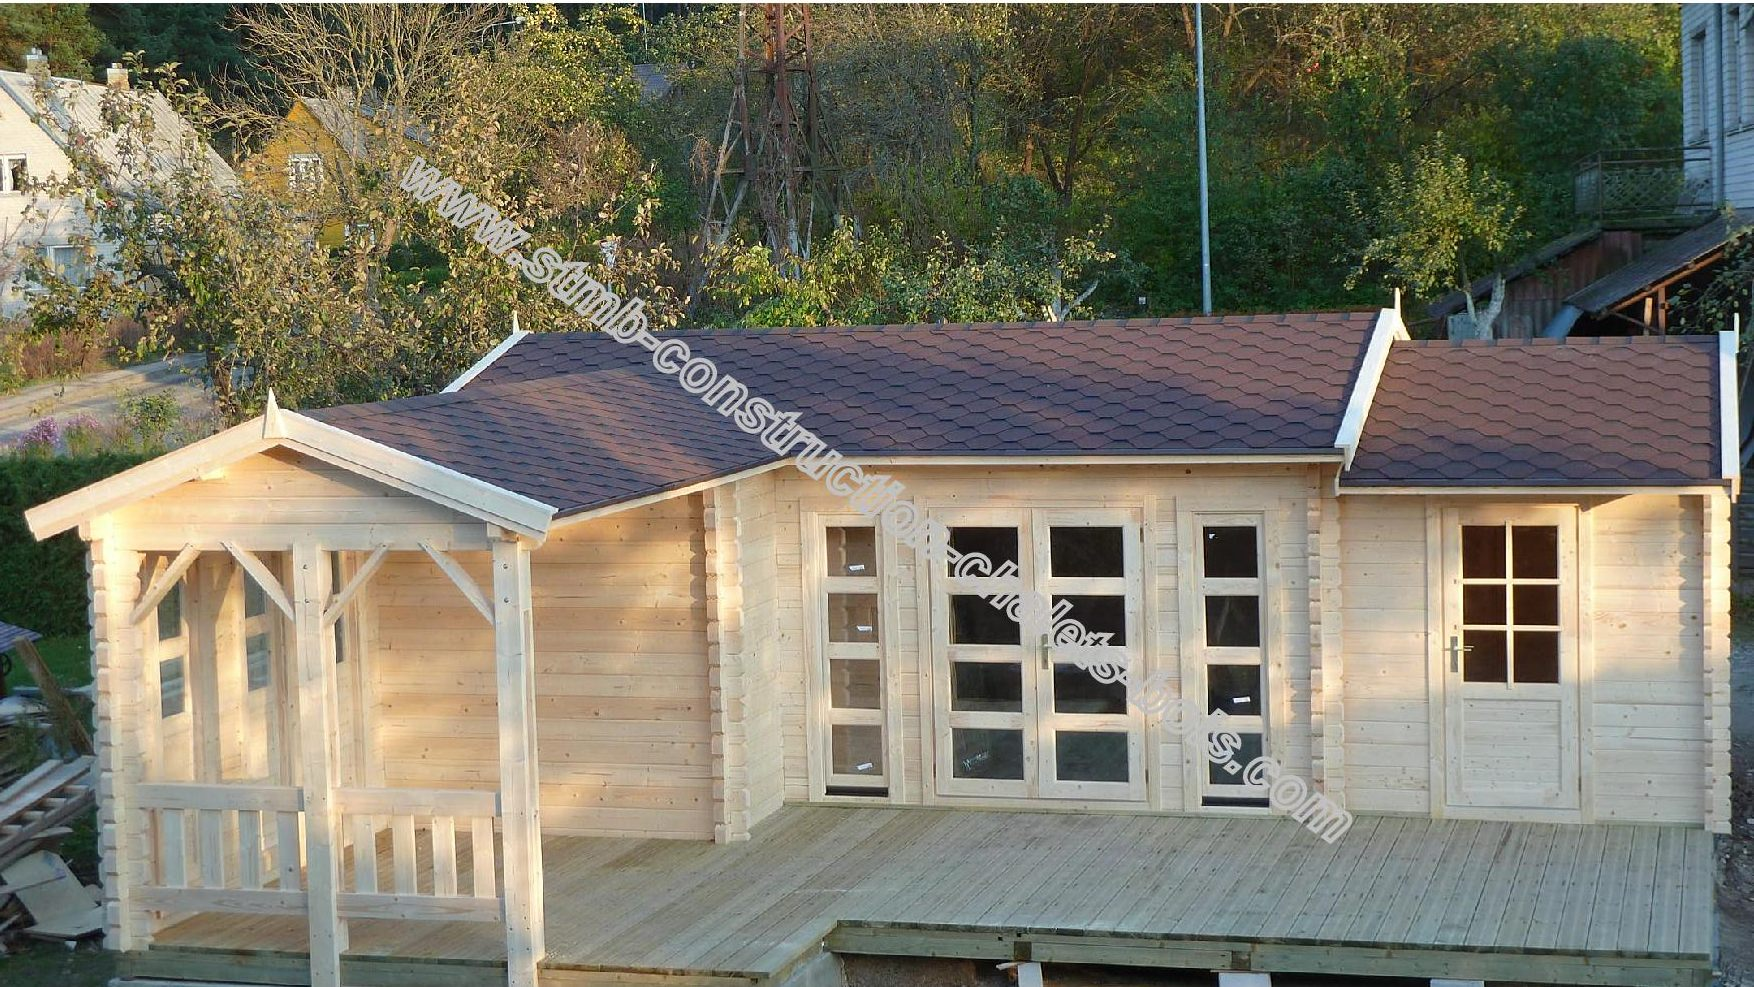 Kit chalet bois habitable CHENE 30 50 m u00b2 habitable + Terrasse # Constructeur Chalet Bois Habitable